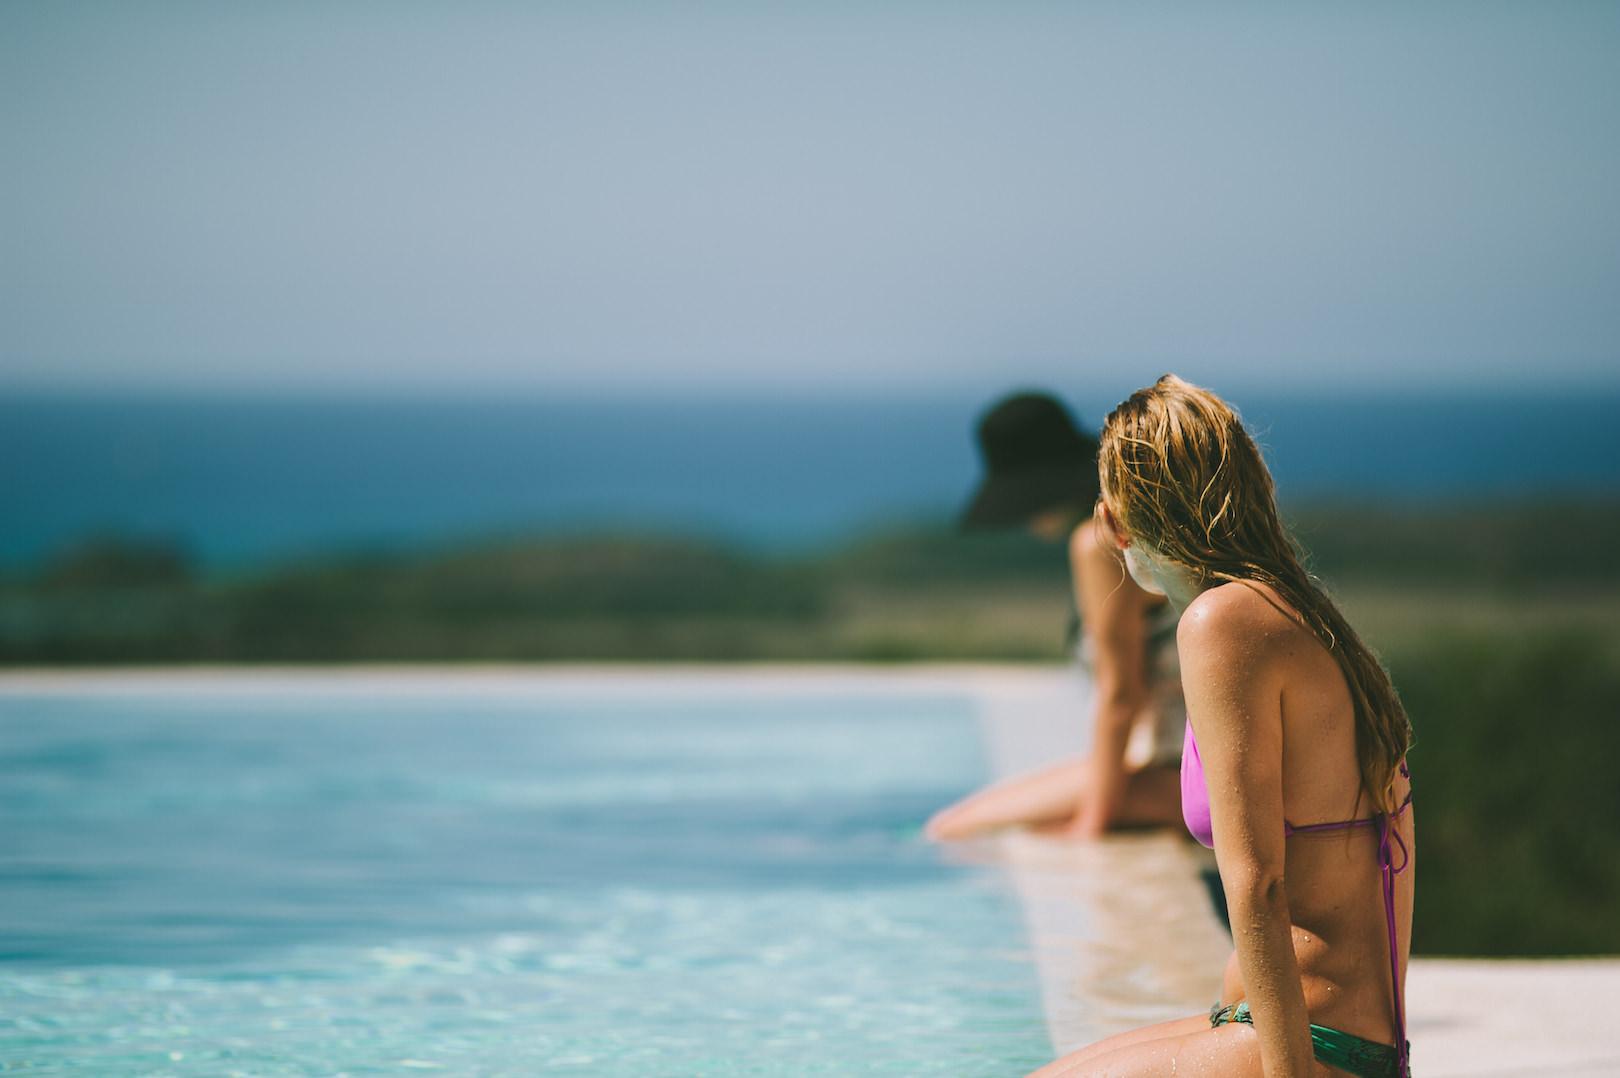 Signature luxury and style magazine best vacation location cuixmala